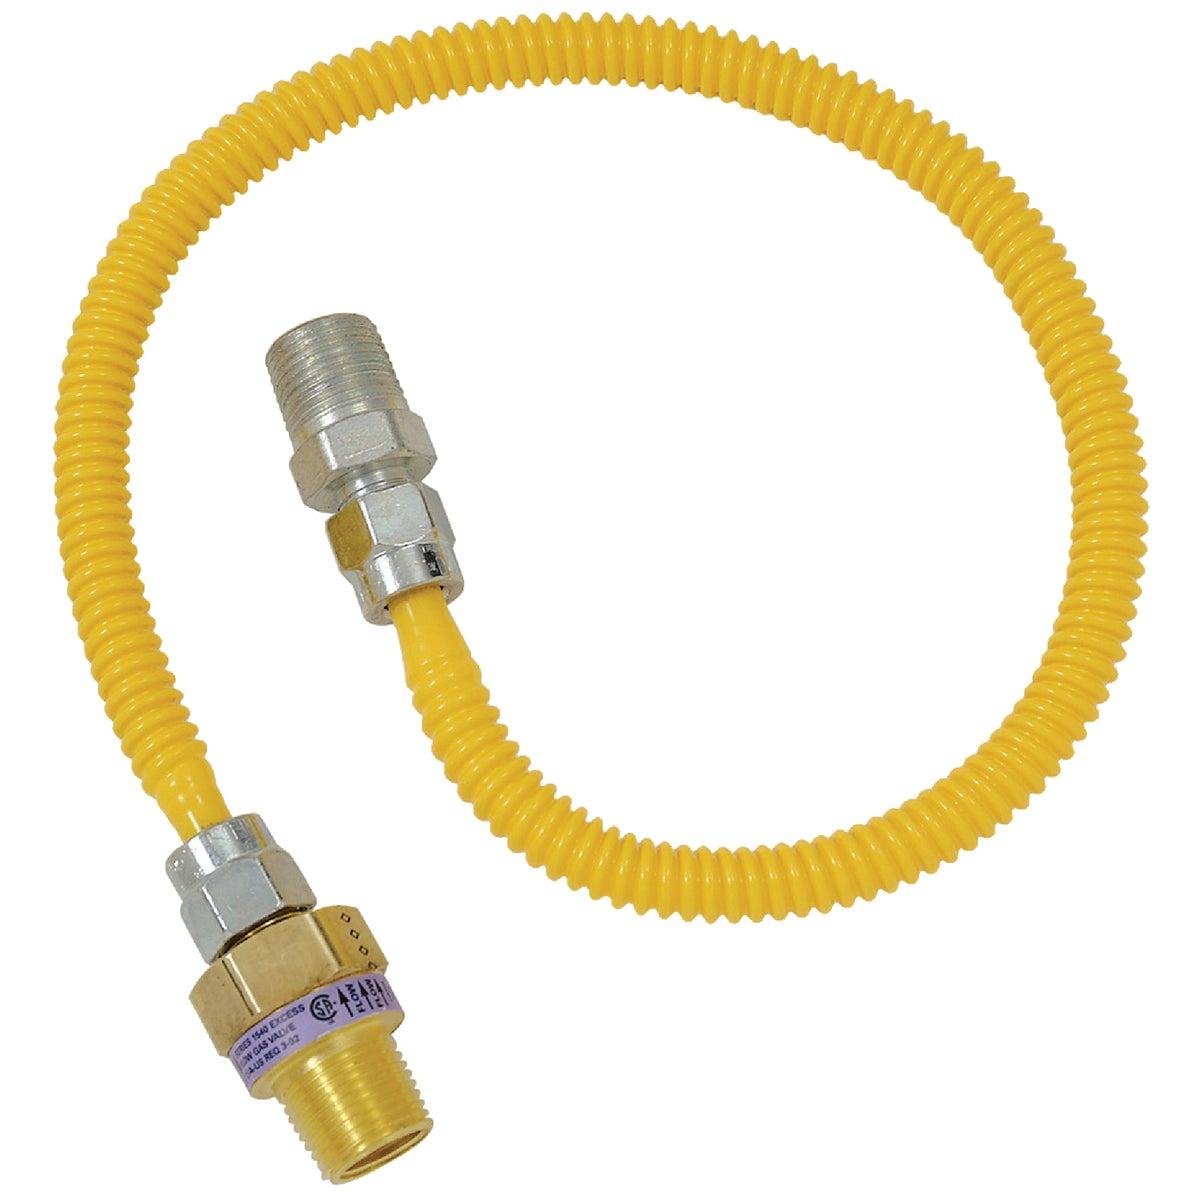 1/2X3/8-24 GAS CONNECTOR - CSSL44E-24P by Brass Craft